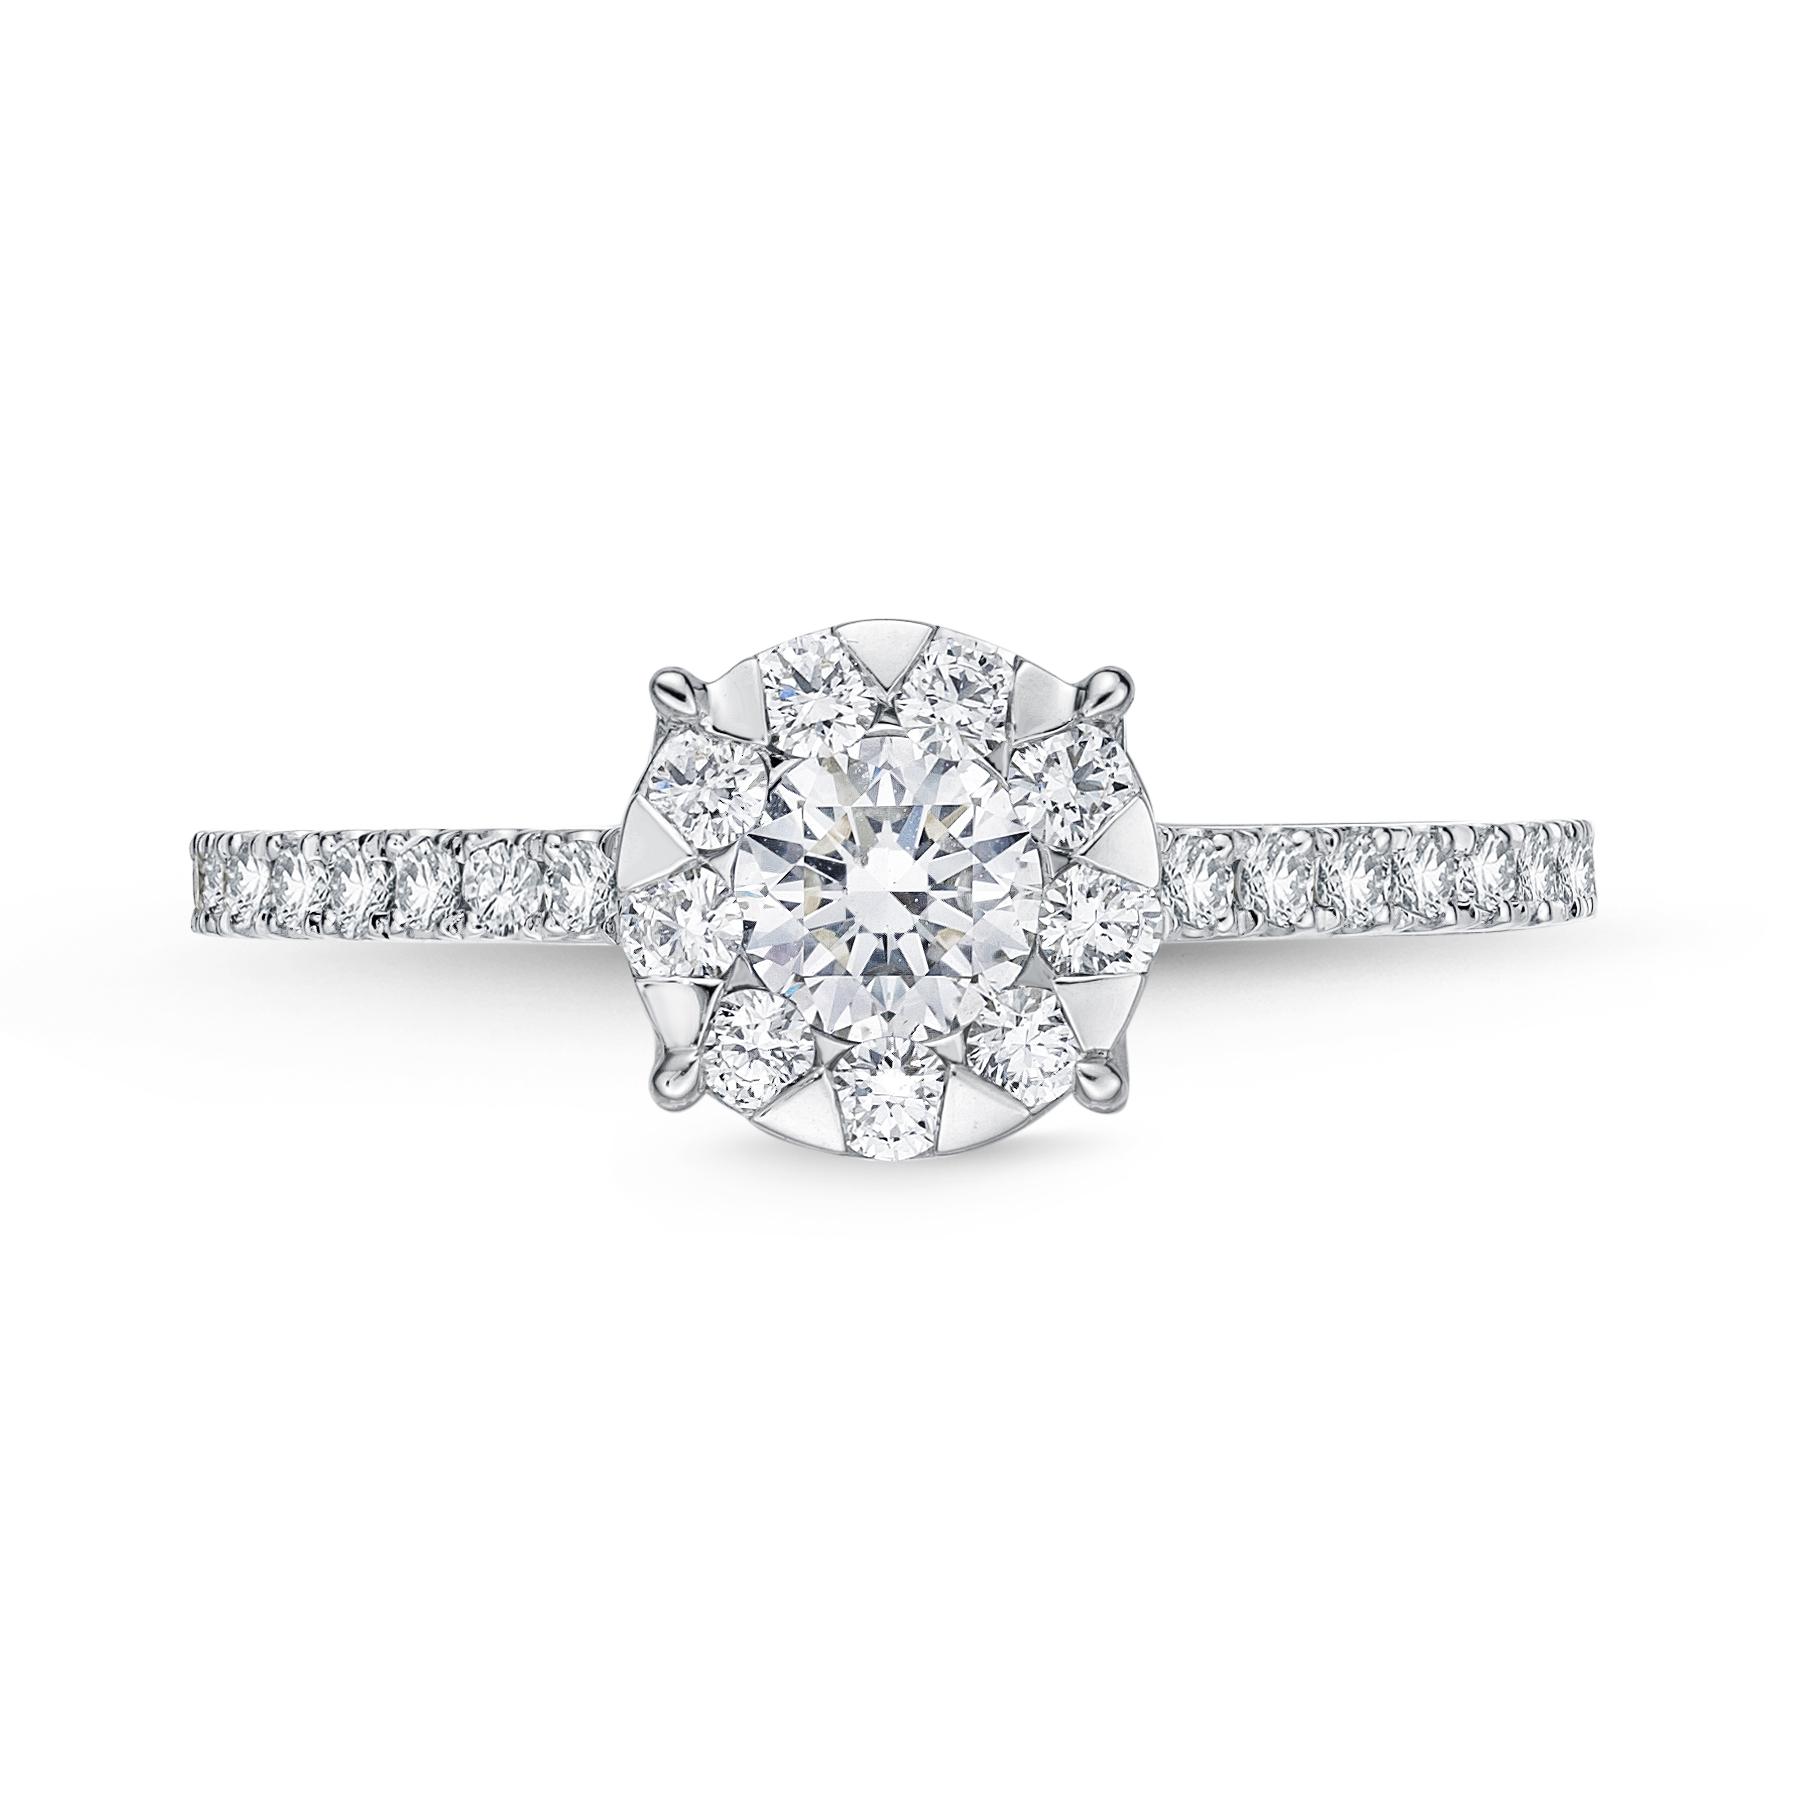 Memoire 18ct White Gold 0.45 Carat Diamond Bouquet Halo Solitaire Ring